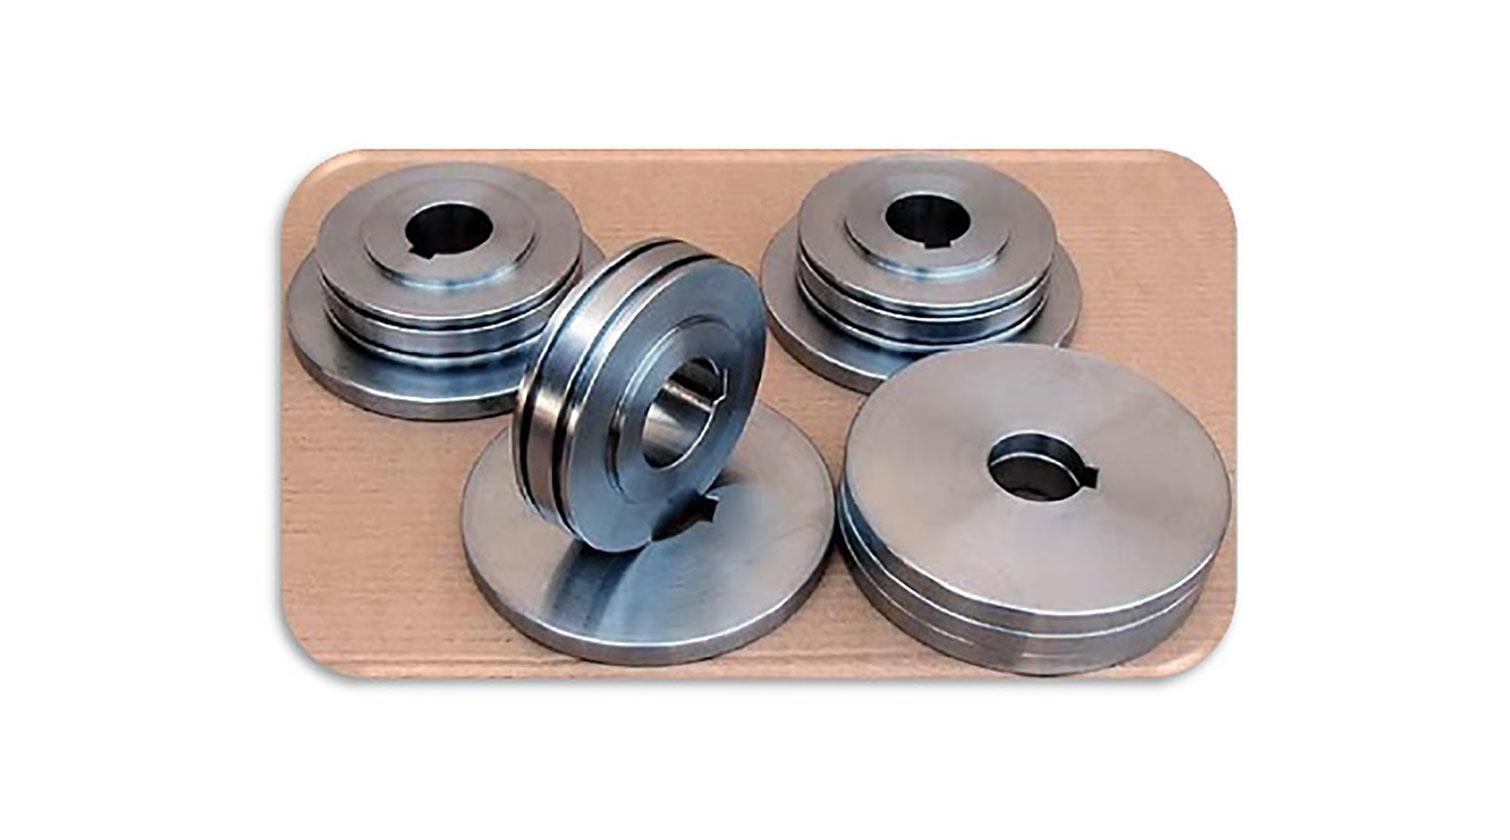 INT aluminum bending 3C Clomea steel rollers 1